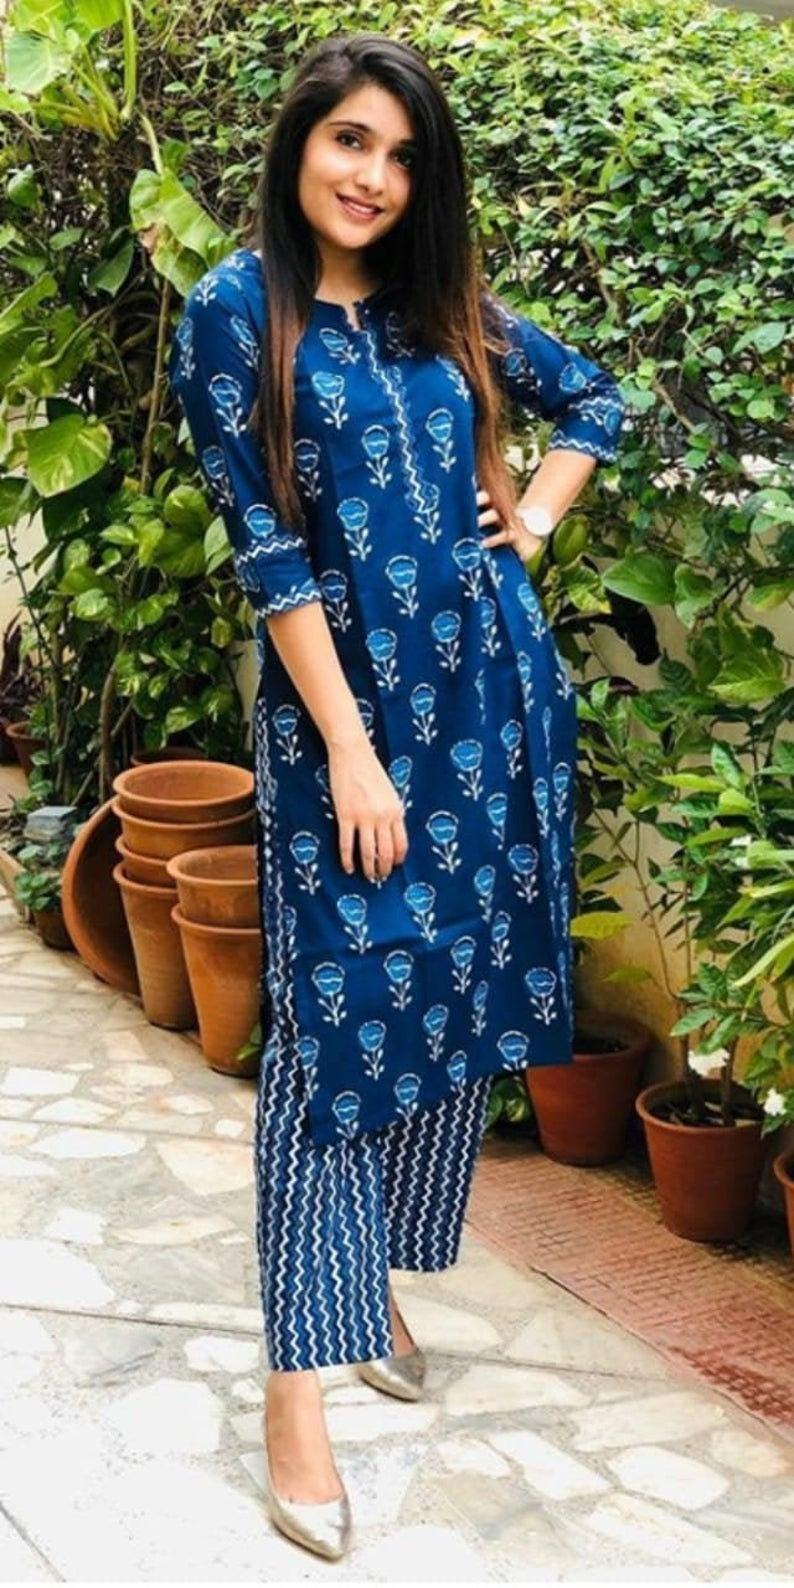 زفاف - Women kurti with pant kurti set kurti pant set kurti set for women kurti dress kurti kurta kurti pant set kurti with pant Indian kurti set